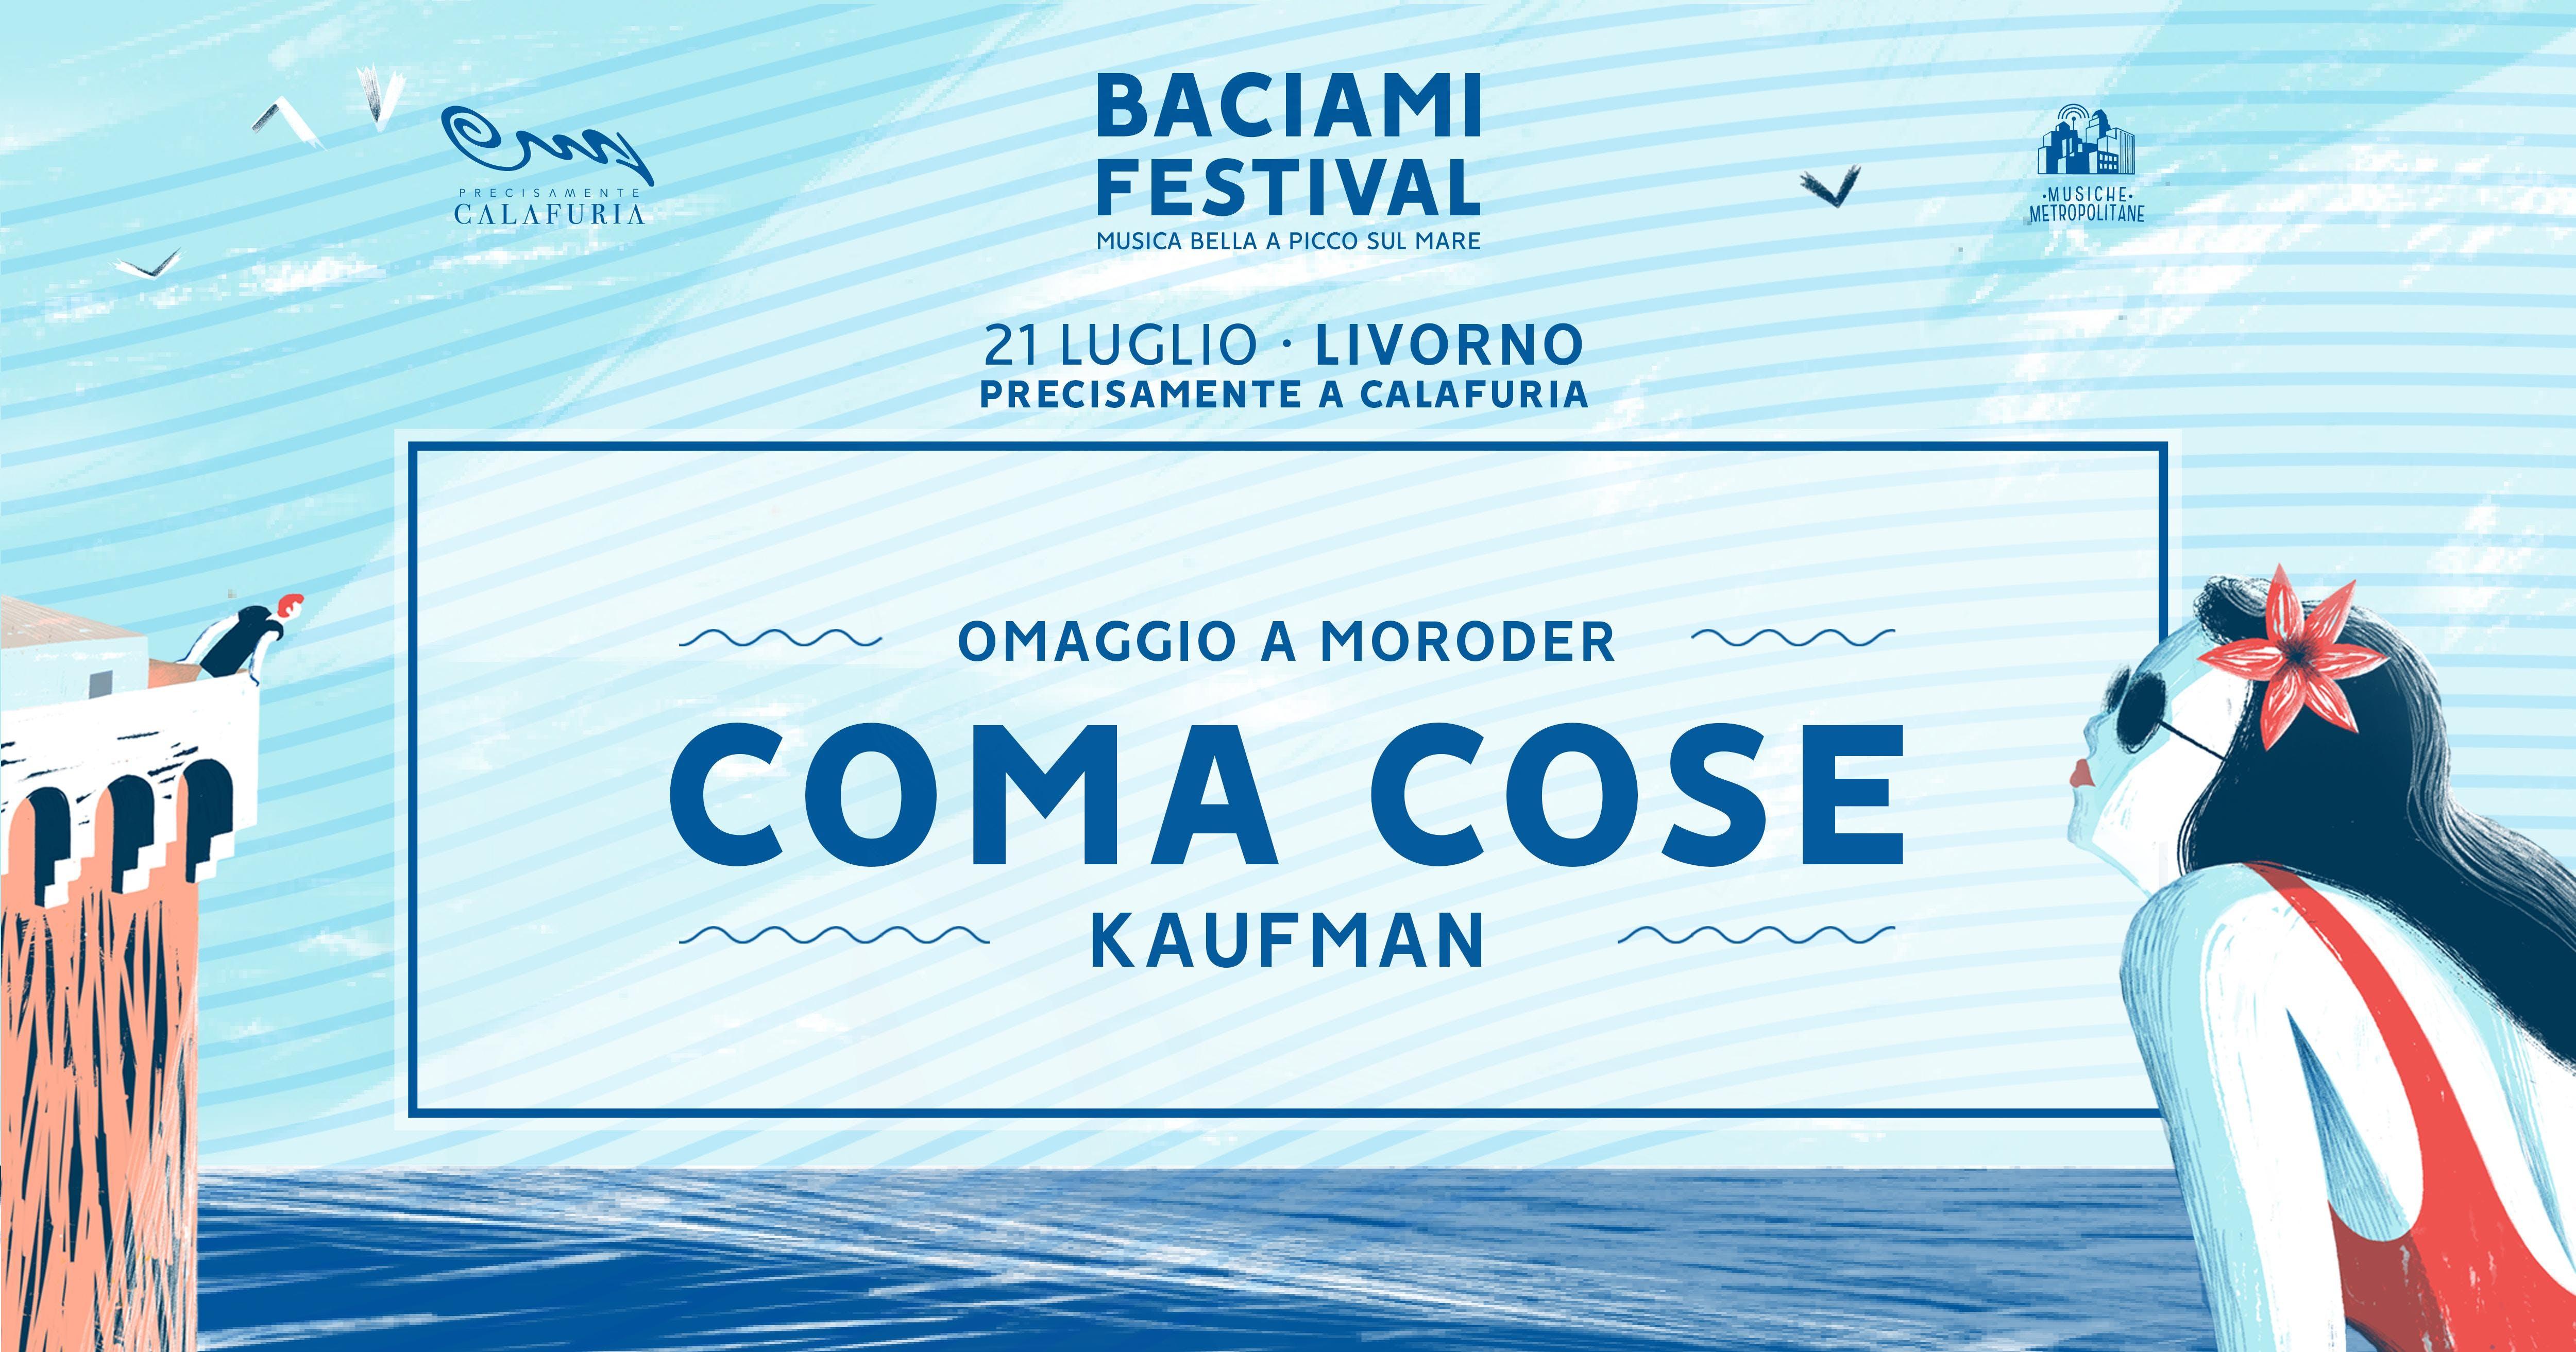 Coma Cose + Kaufman • Baciami Festival 2018